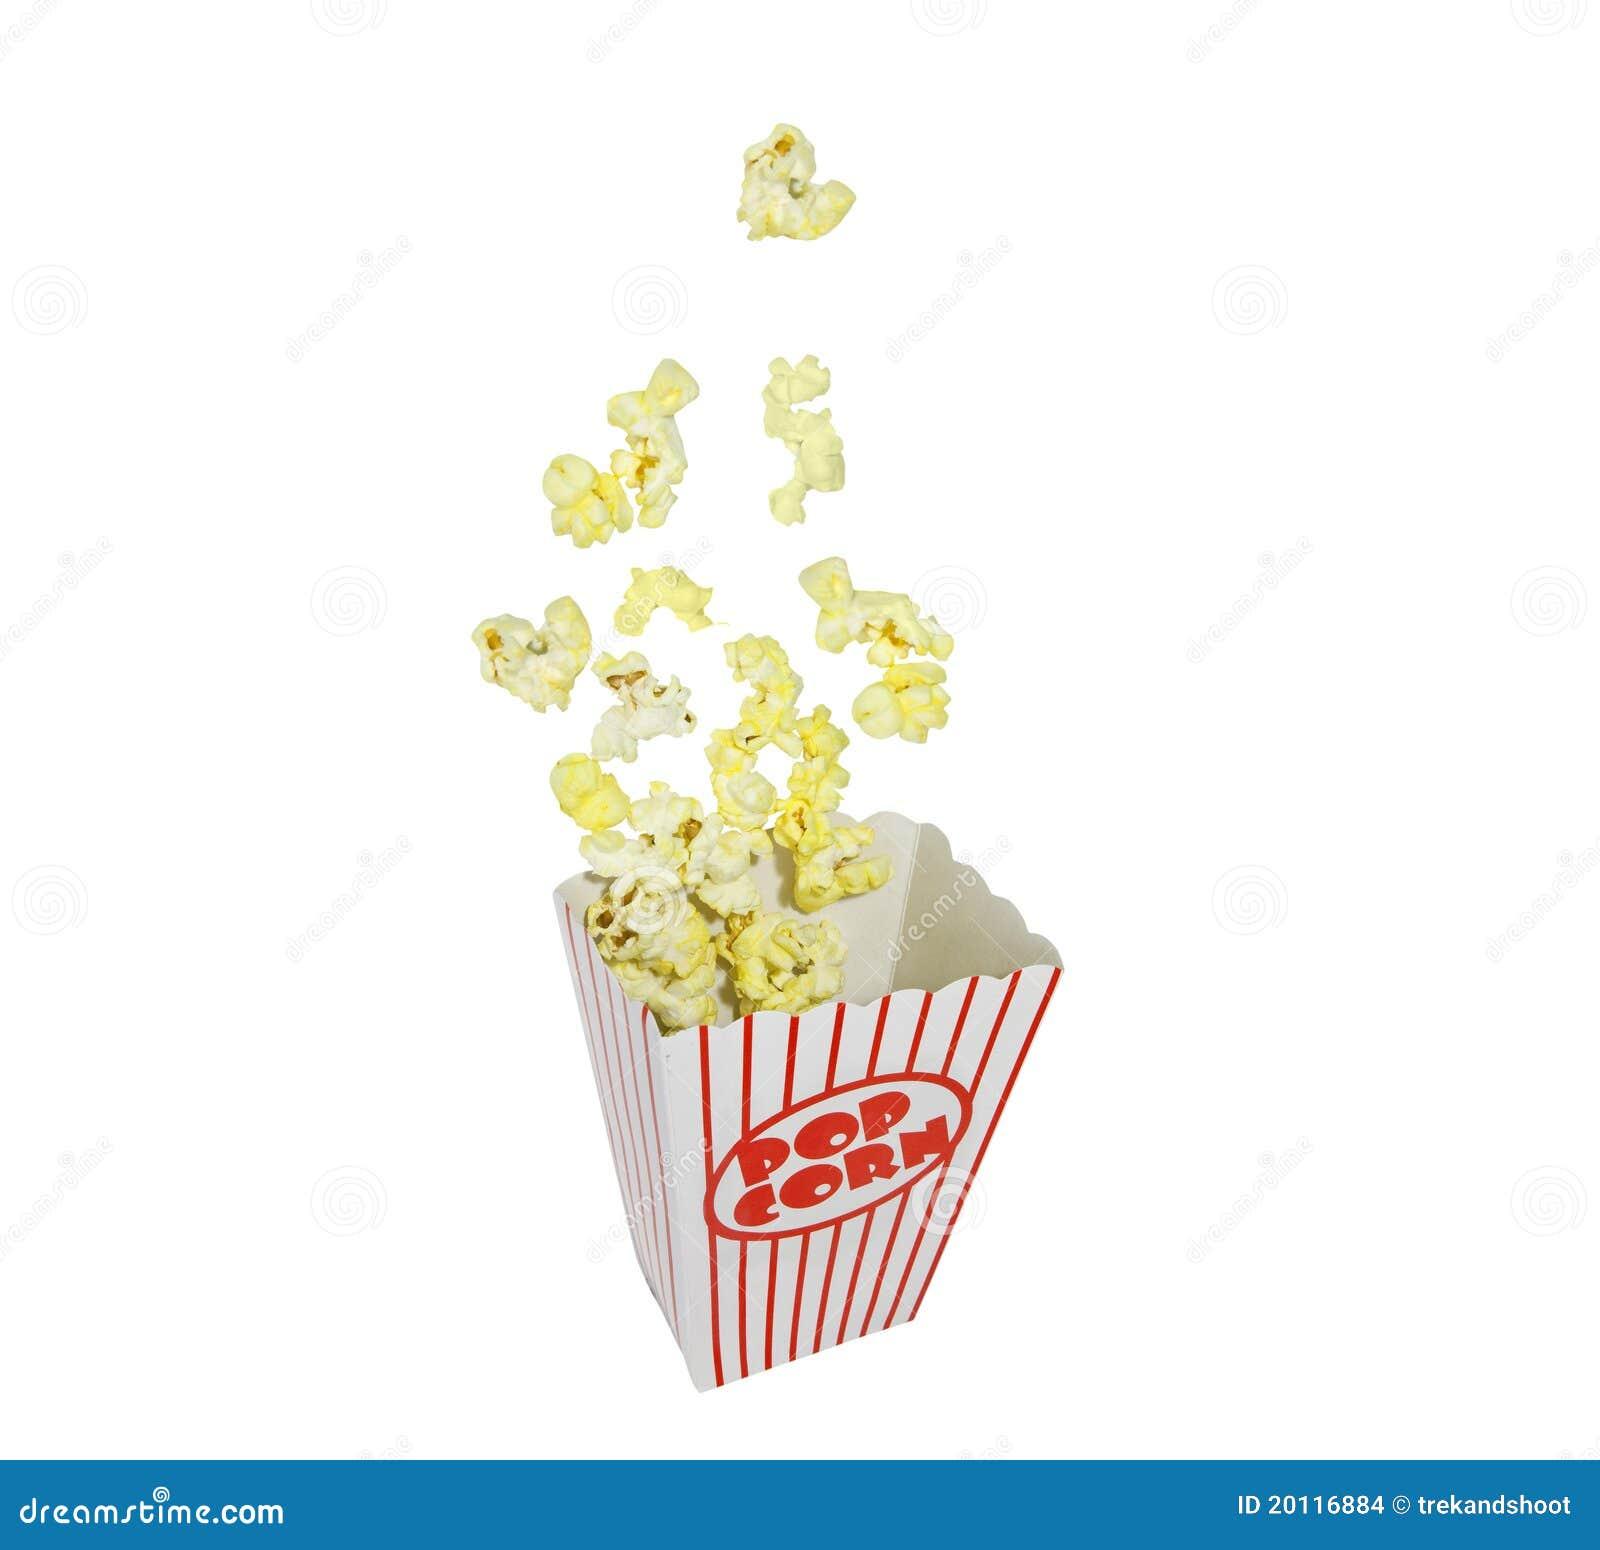 Popping Popcorn Box Stock Images - Image: 20116884